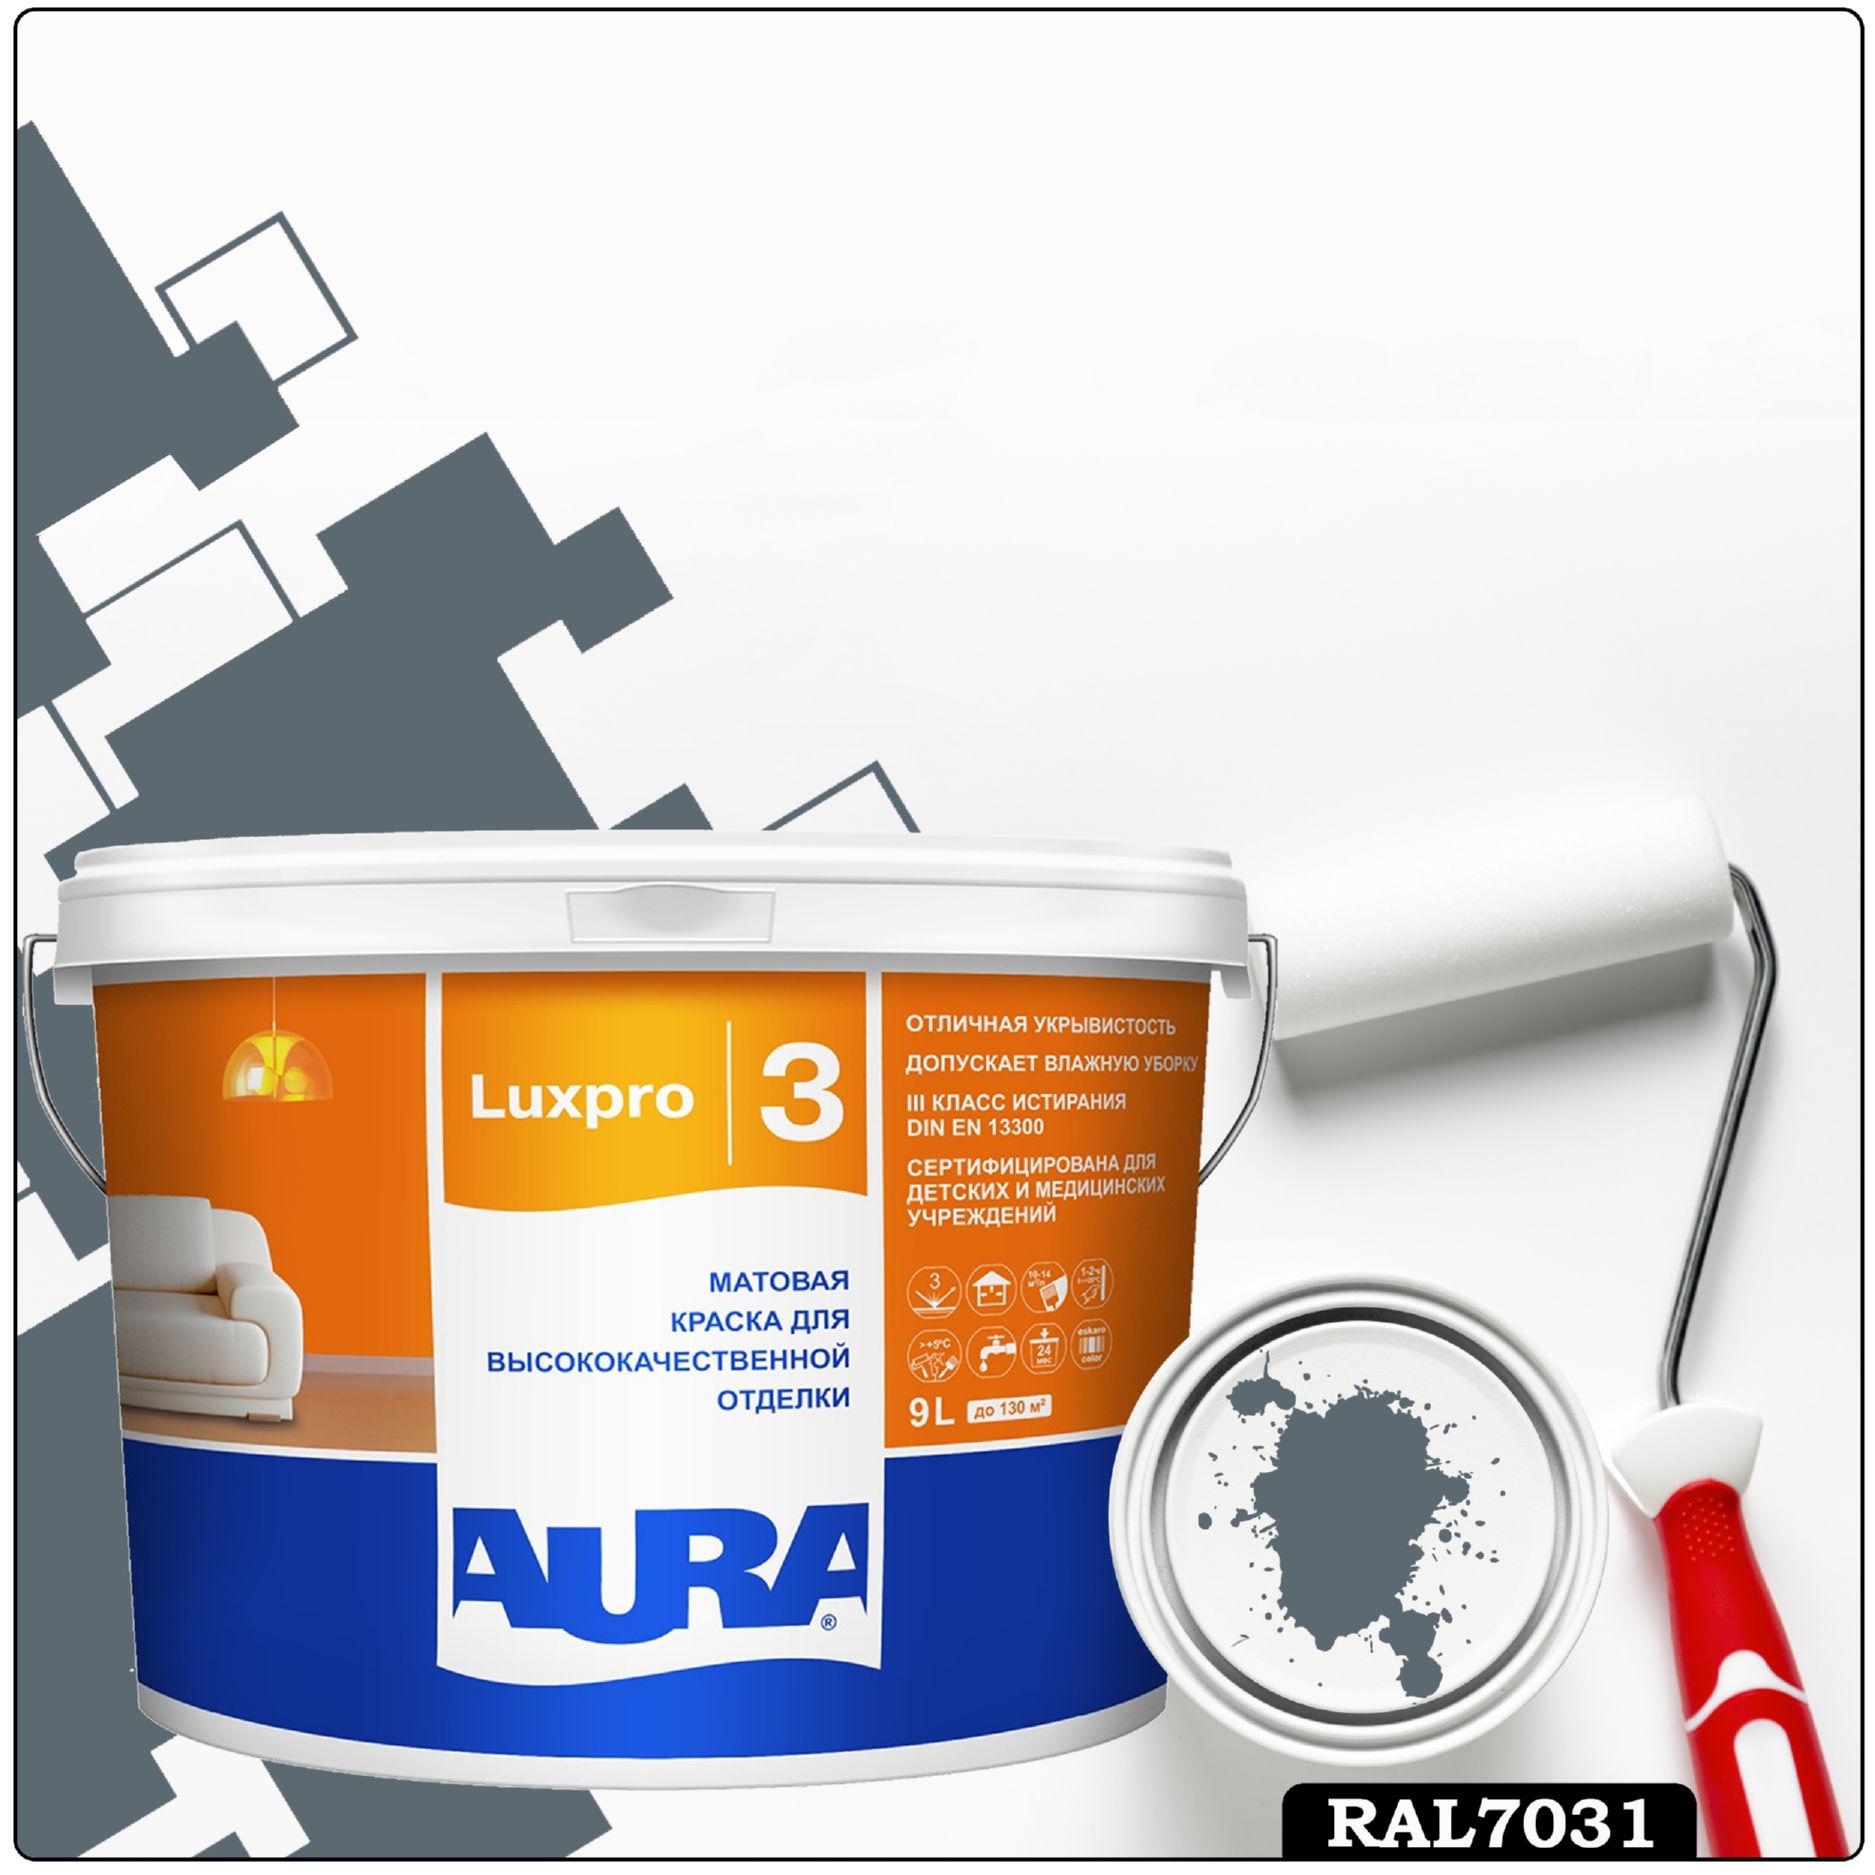 Фото 22 - Краска Aura LuxPRO 3, RAL 7031 Сине-серый, латексная, шелково-матовая, интерьерная, 9л, Аура.